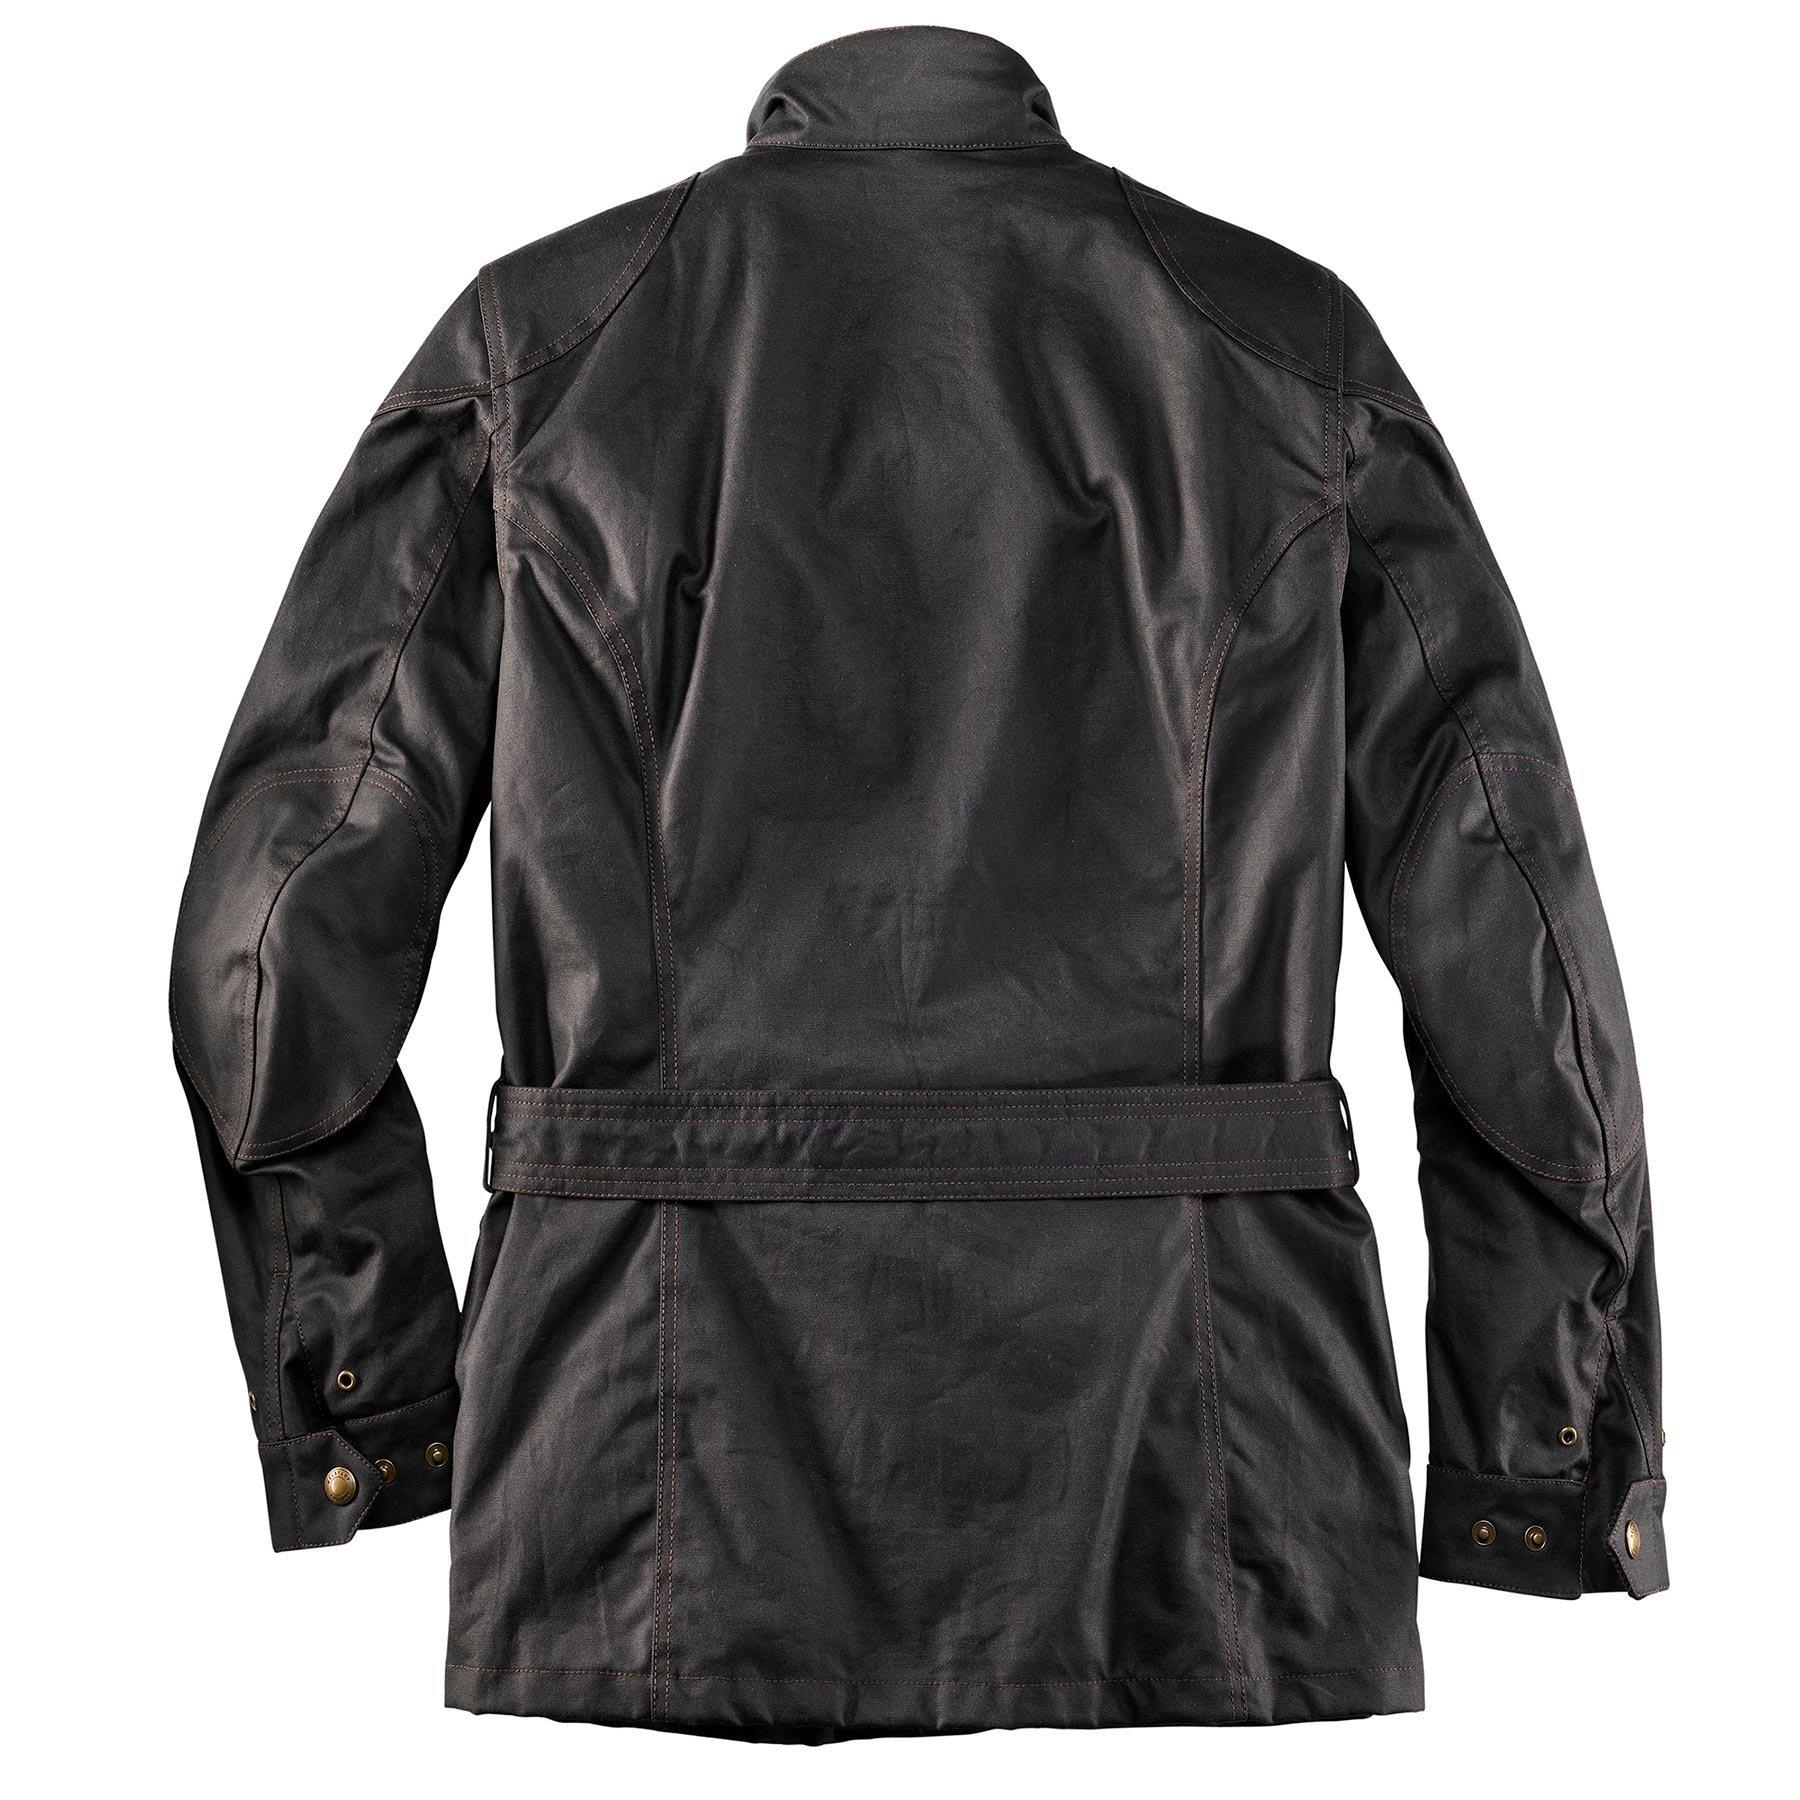 Belstaff Jacke Classic Tourist Cotton   LuxusSale Designer Kleidung ... 07121a8b72